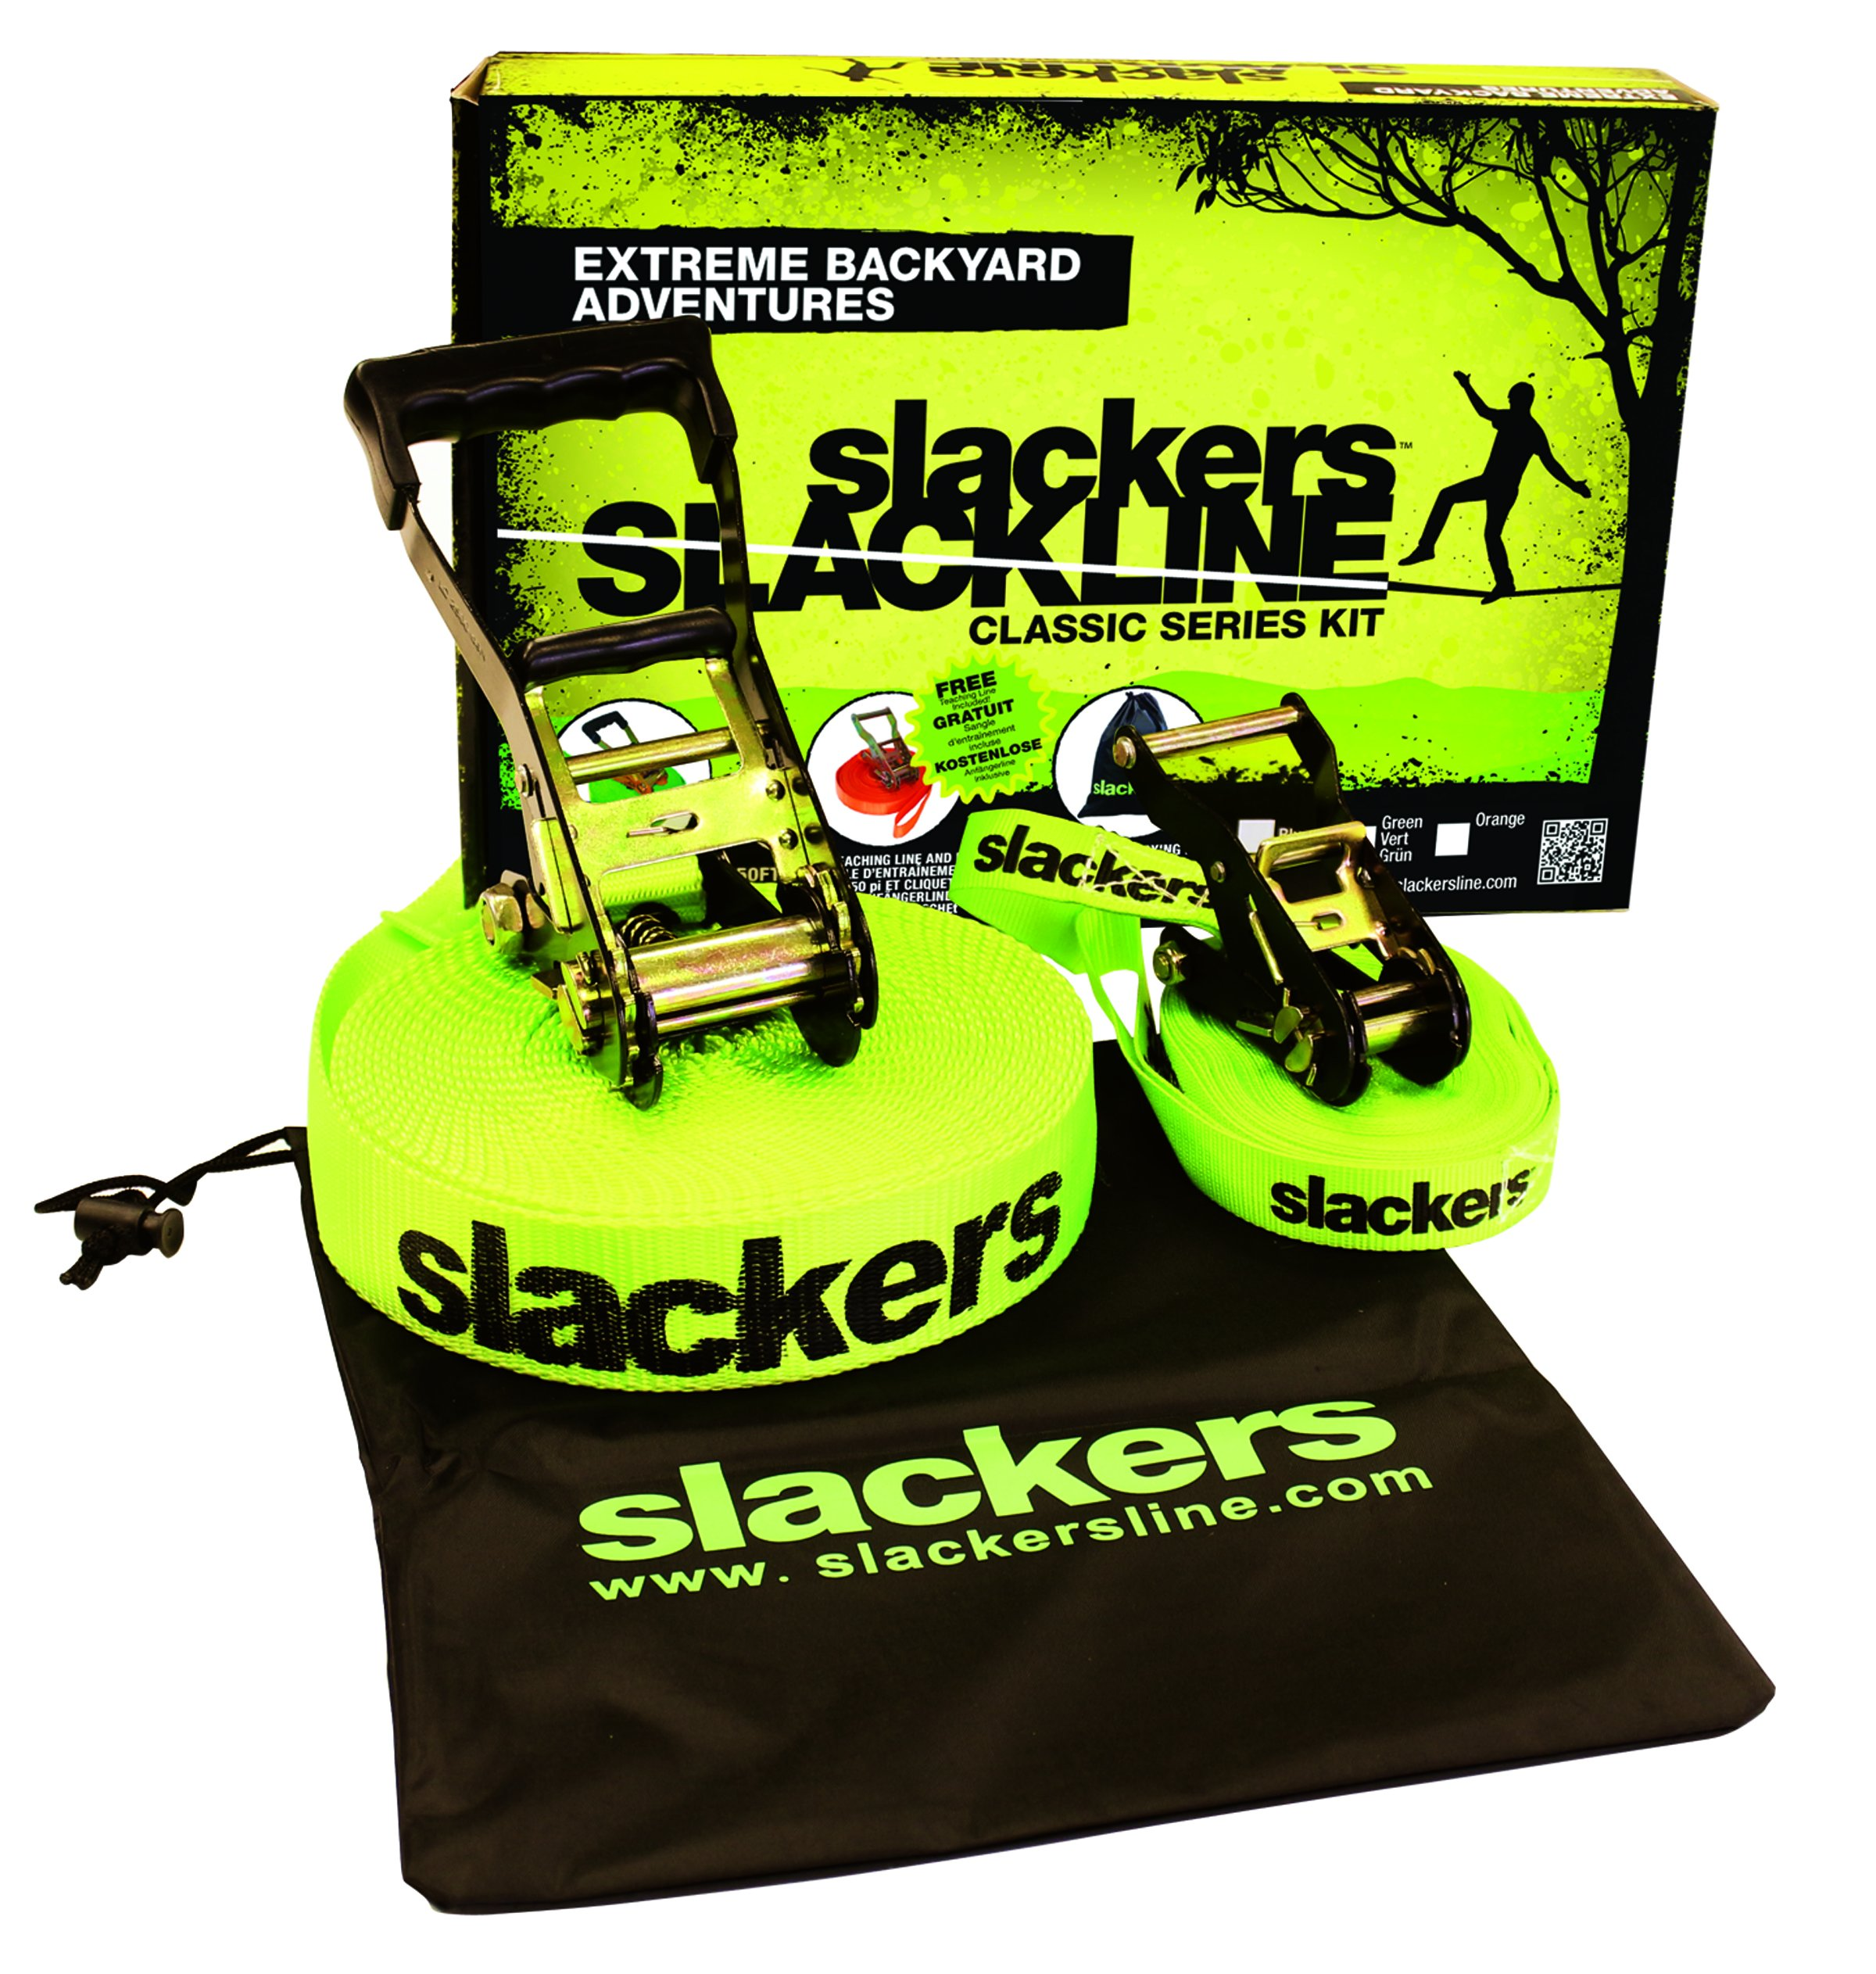 slackers 50-Feet Slackline Classic Set with Bonus Teaching Line, Assorted color by Slackers